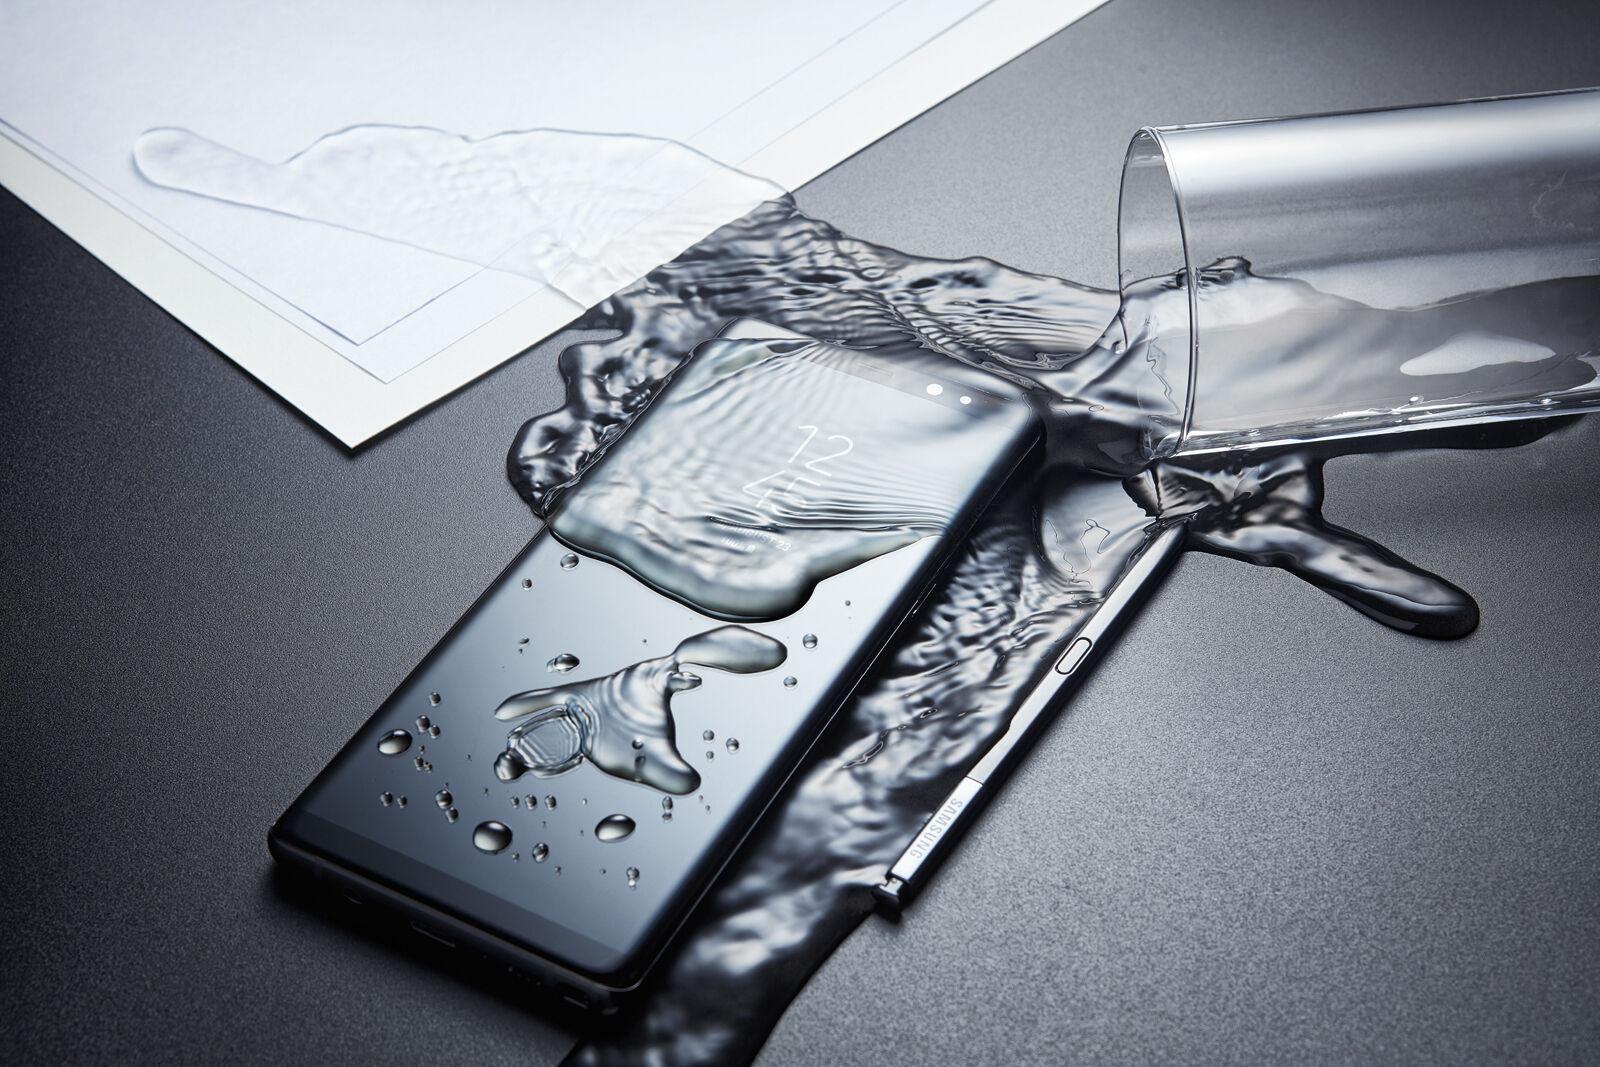 Harga Spesifikasi Samsung Galaxy Note 8 3